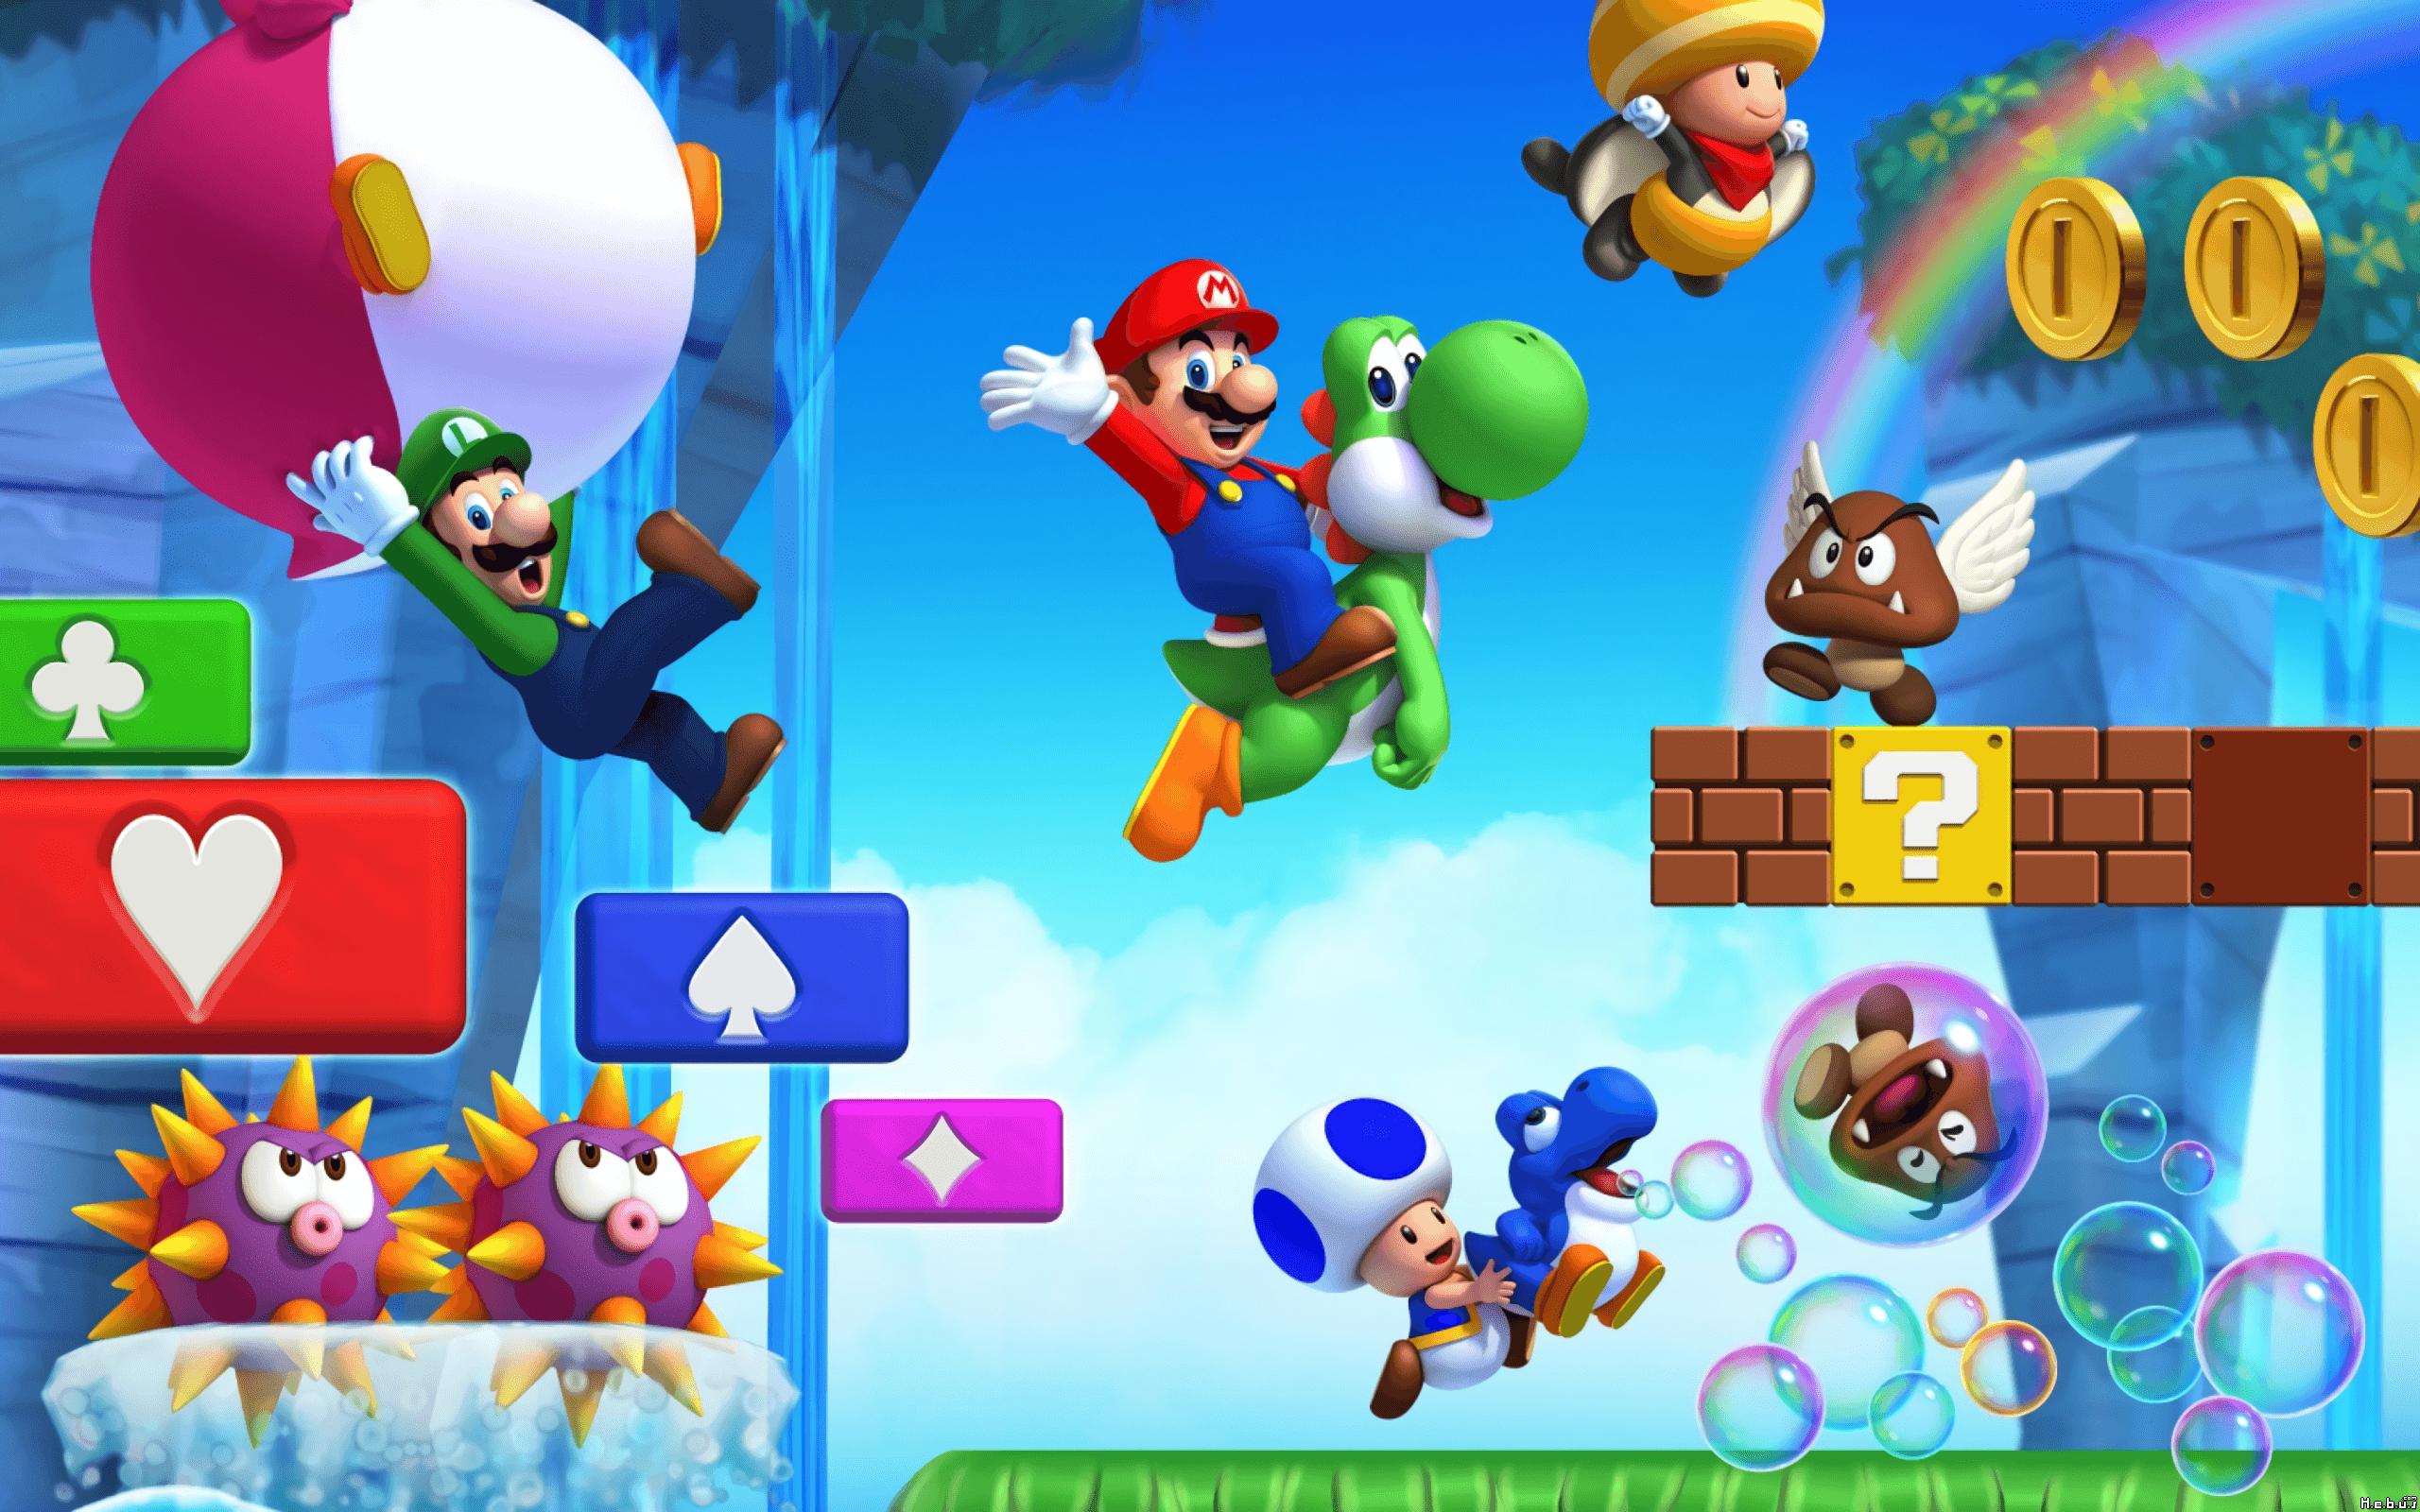 Super Mario Galaxy Wallpaper Laptop ✓ The Best HD Wallpaper